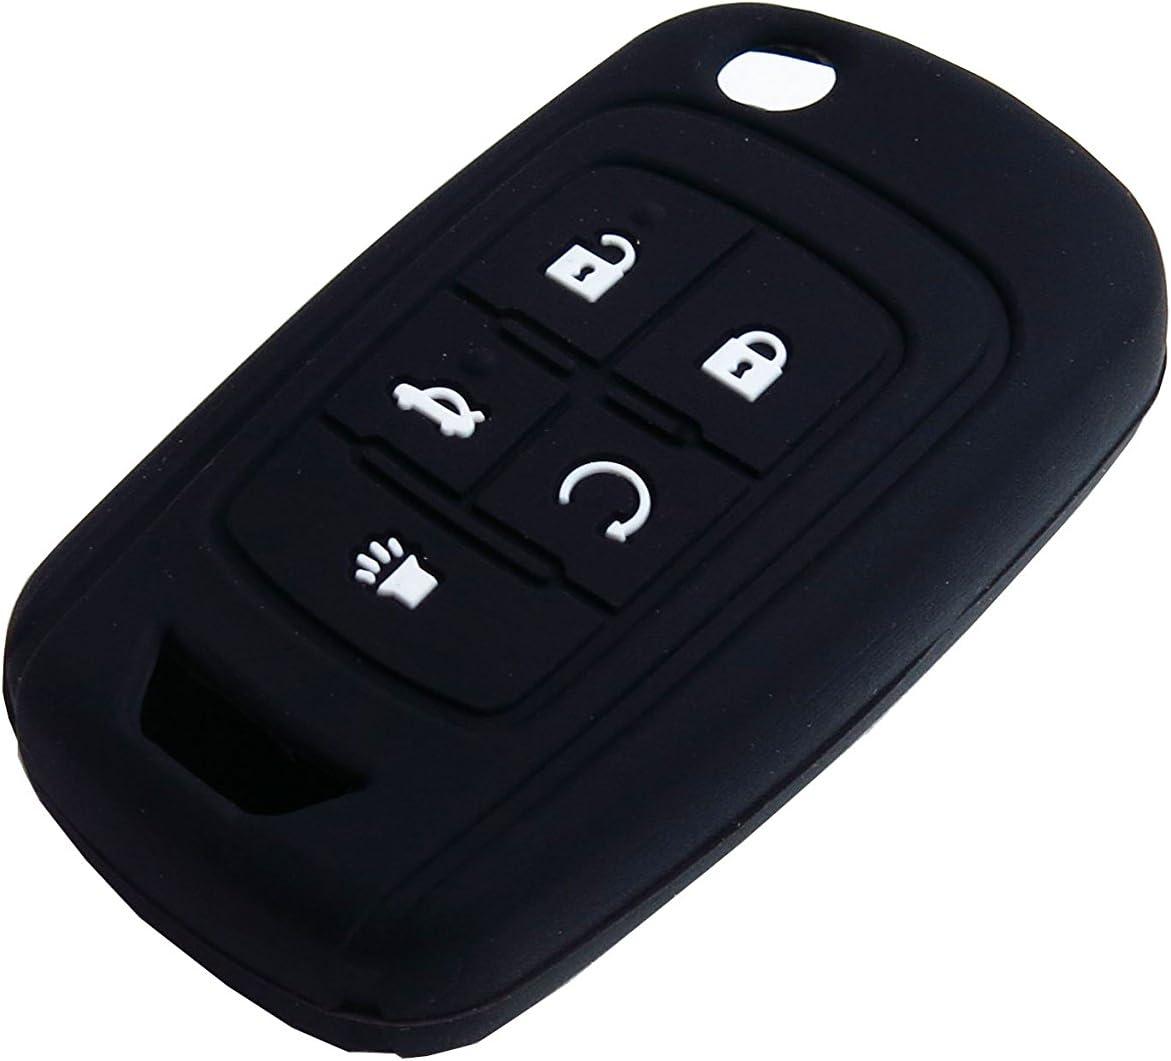 1 Pcs Pink BAR Autotech Remote Key TPU Keyless Entry Shell Case Fob and Key Skin Cover fit for Chevrolet Camaro Cruze Volt Equinox Spark Malibu Sonic